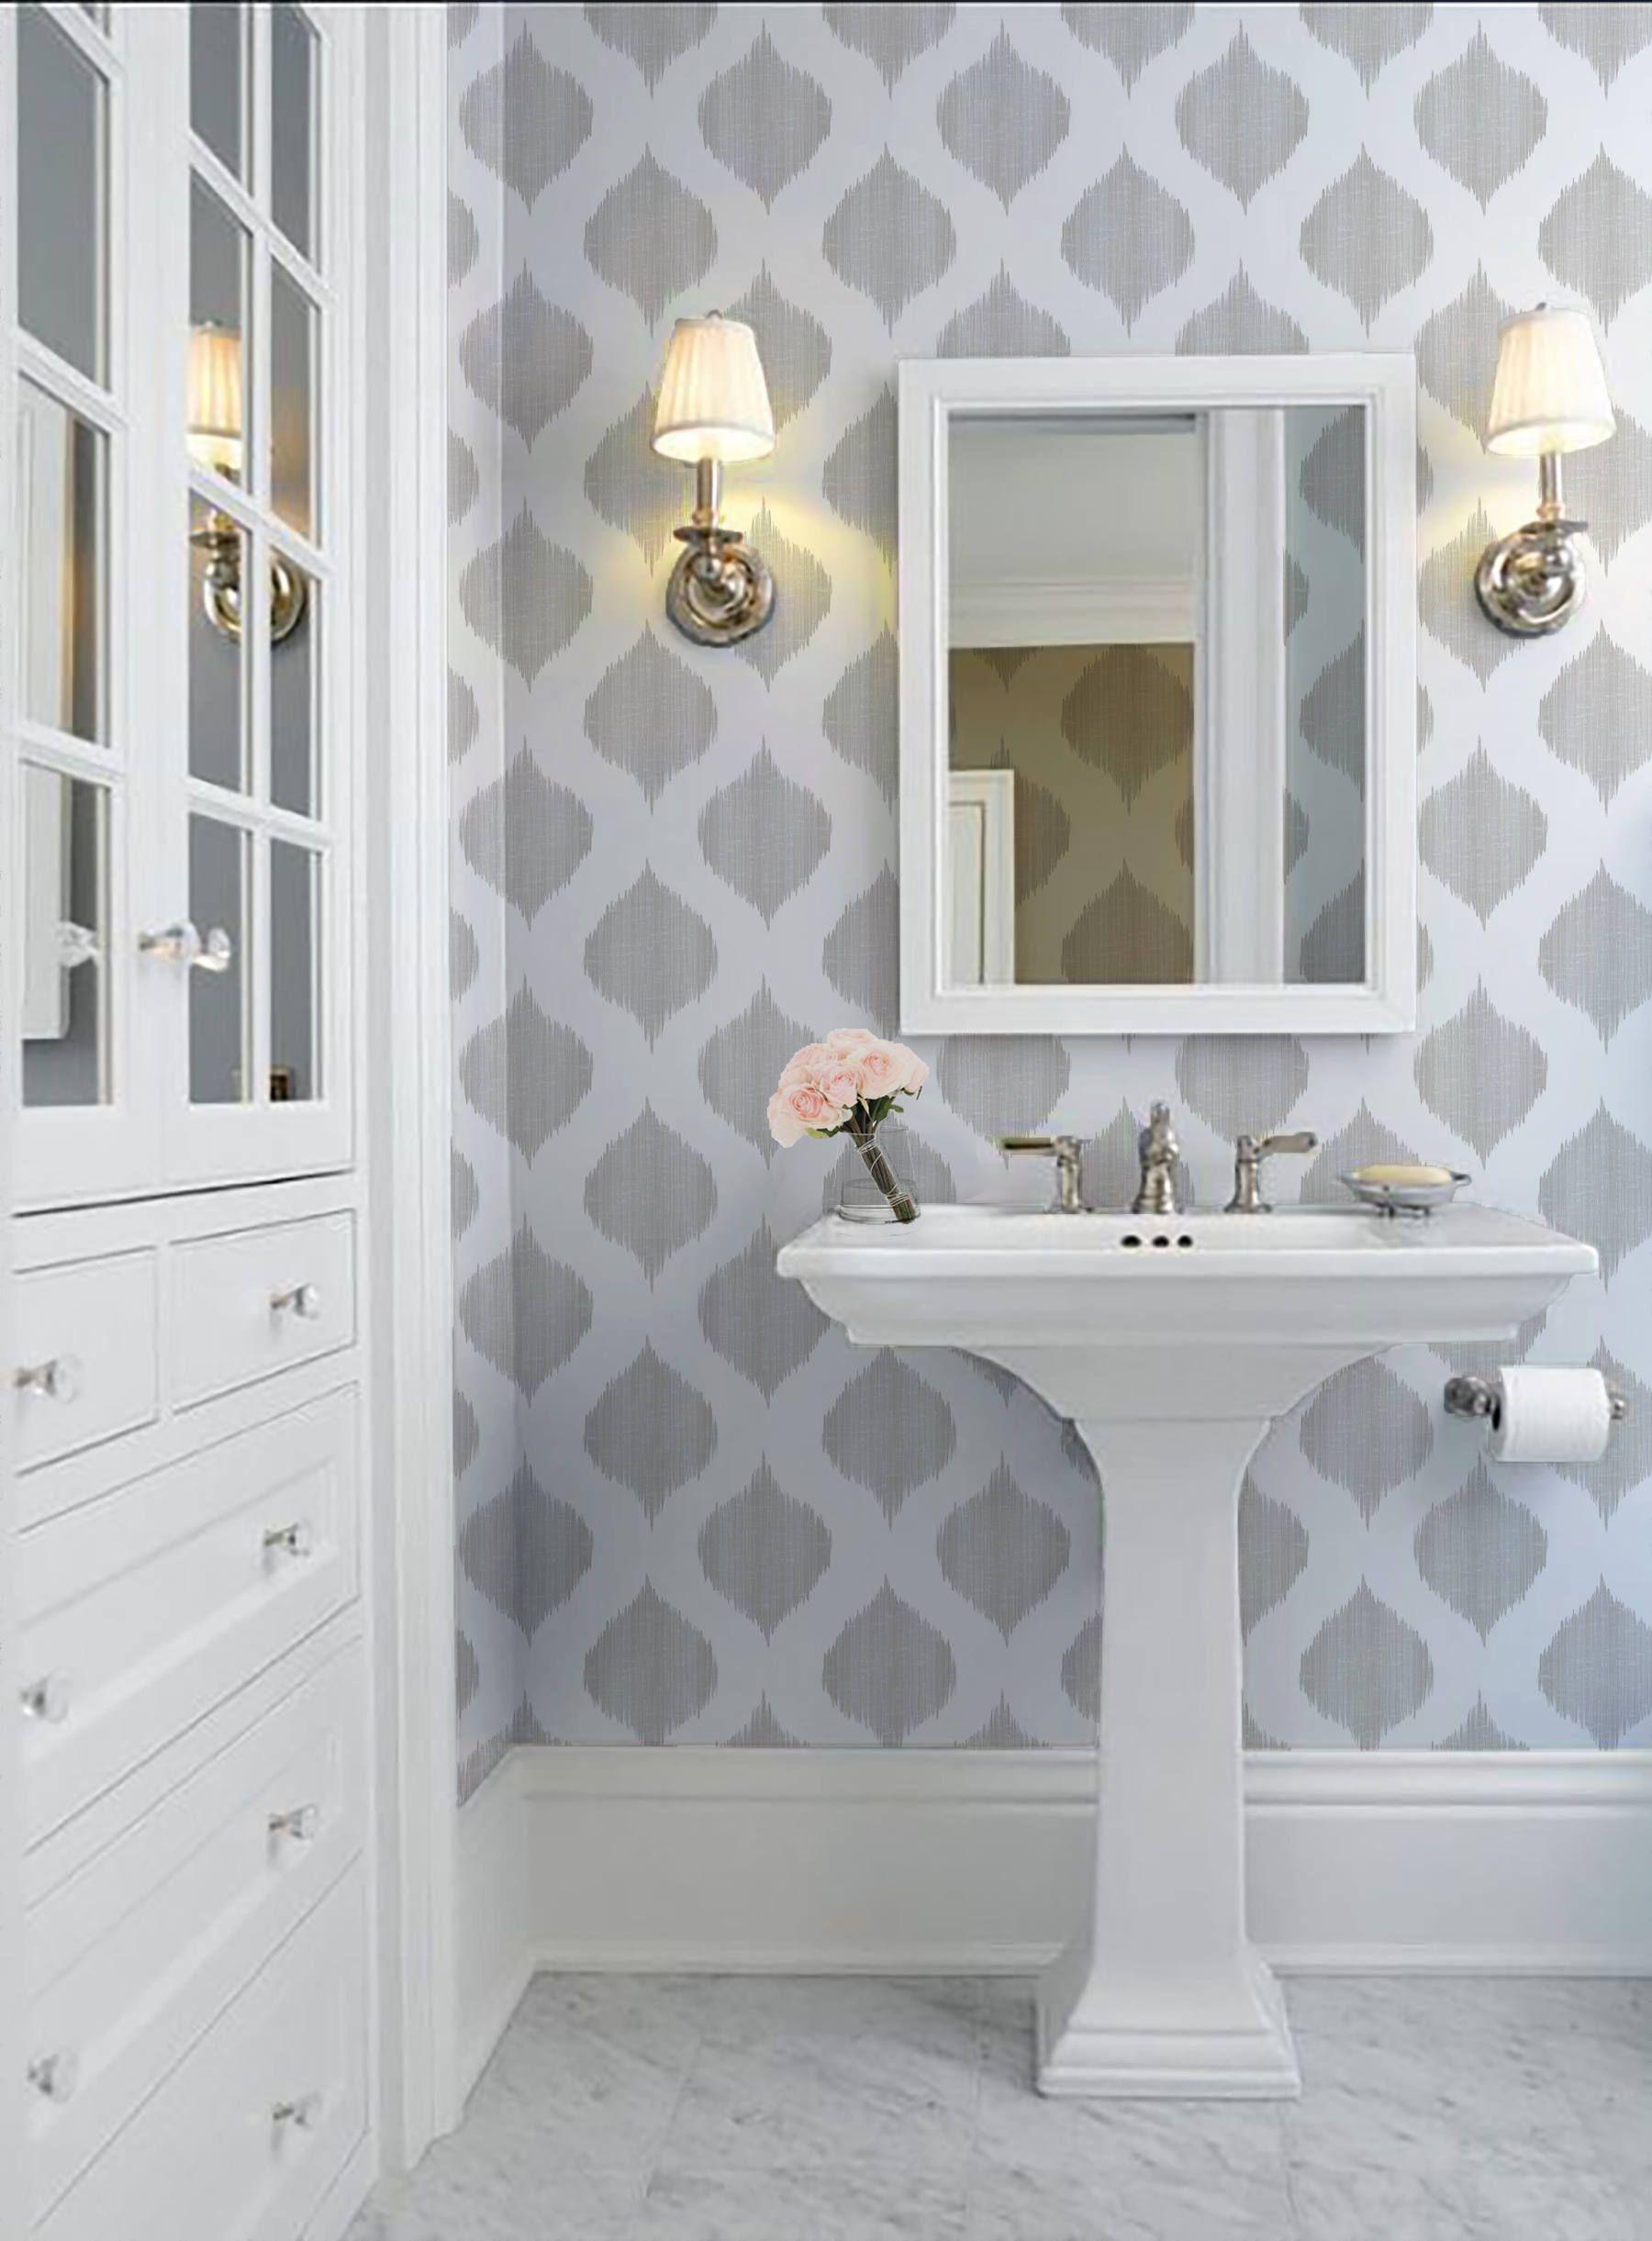 Ikat Dots Repositionable Peel N Stick Wallpaper Etsy Peel N Stick Wallpaper Ikat Dot Bathroom Wallpaper